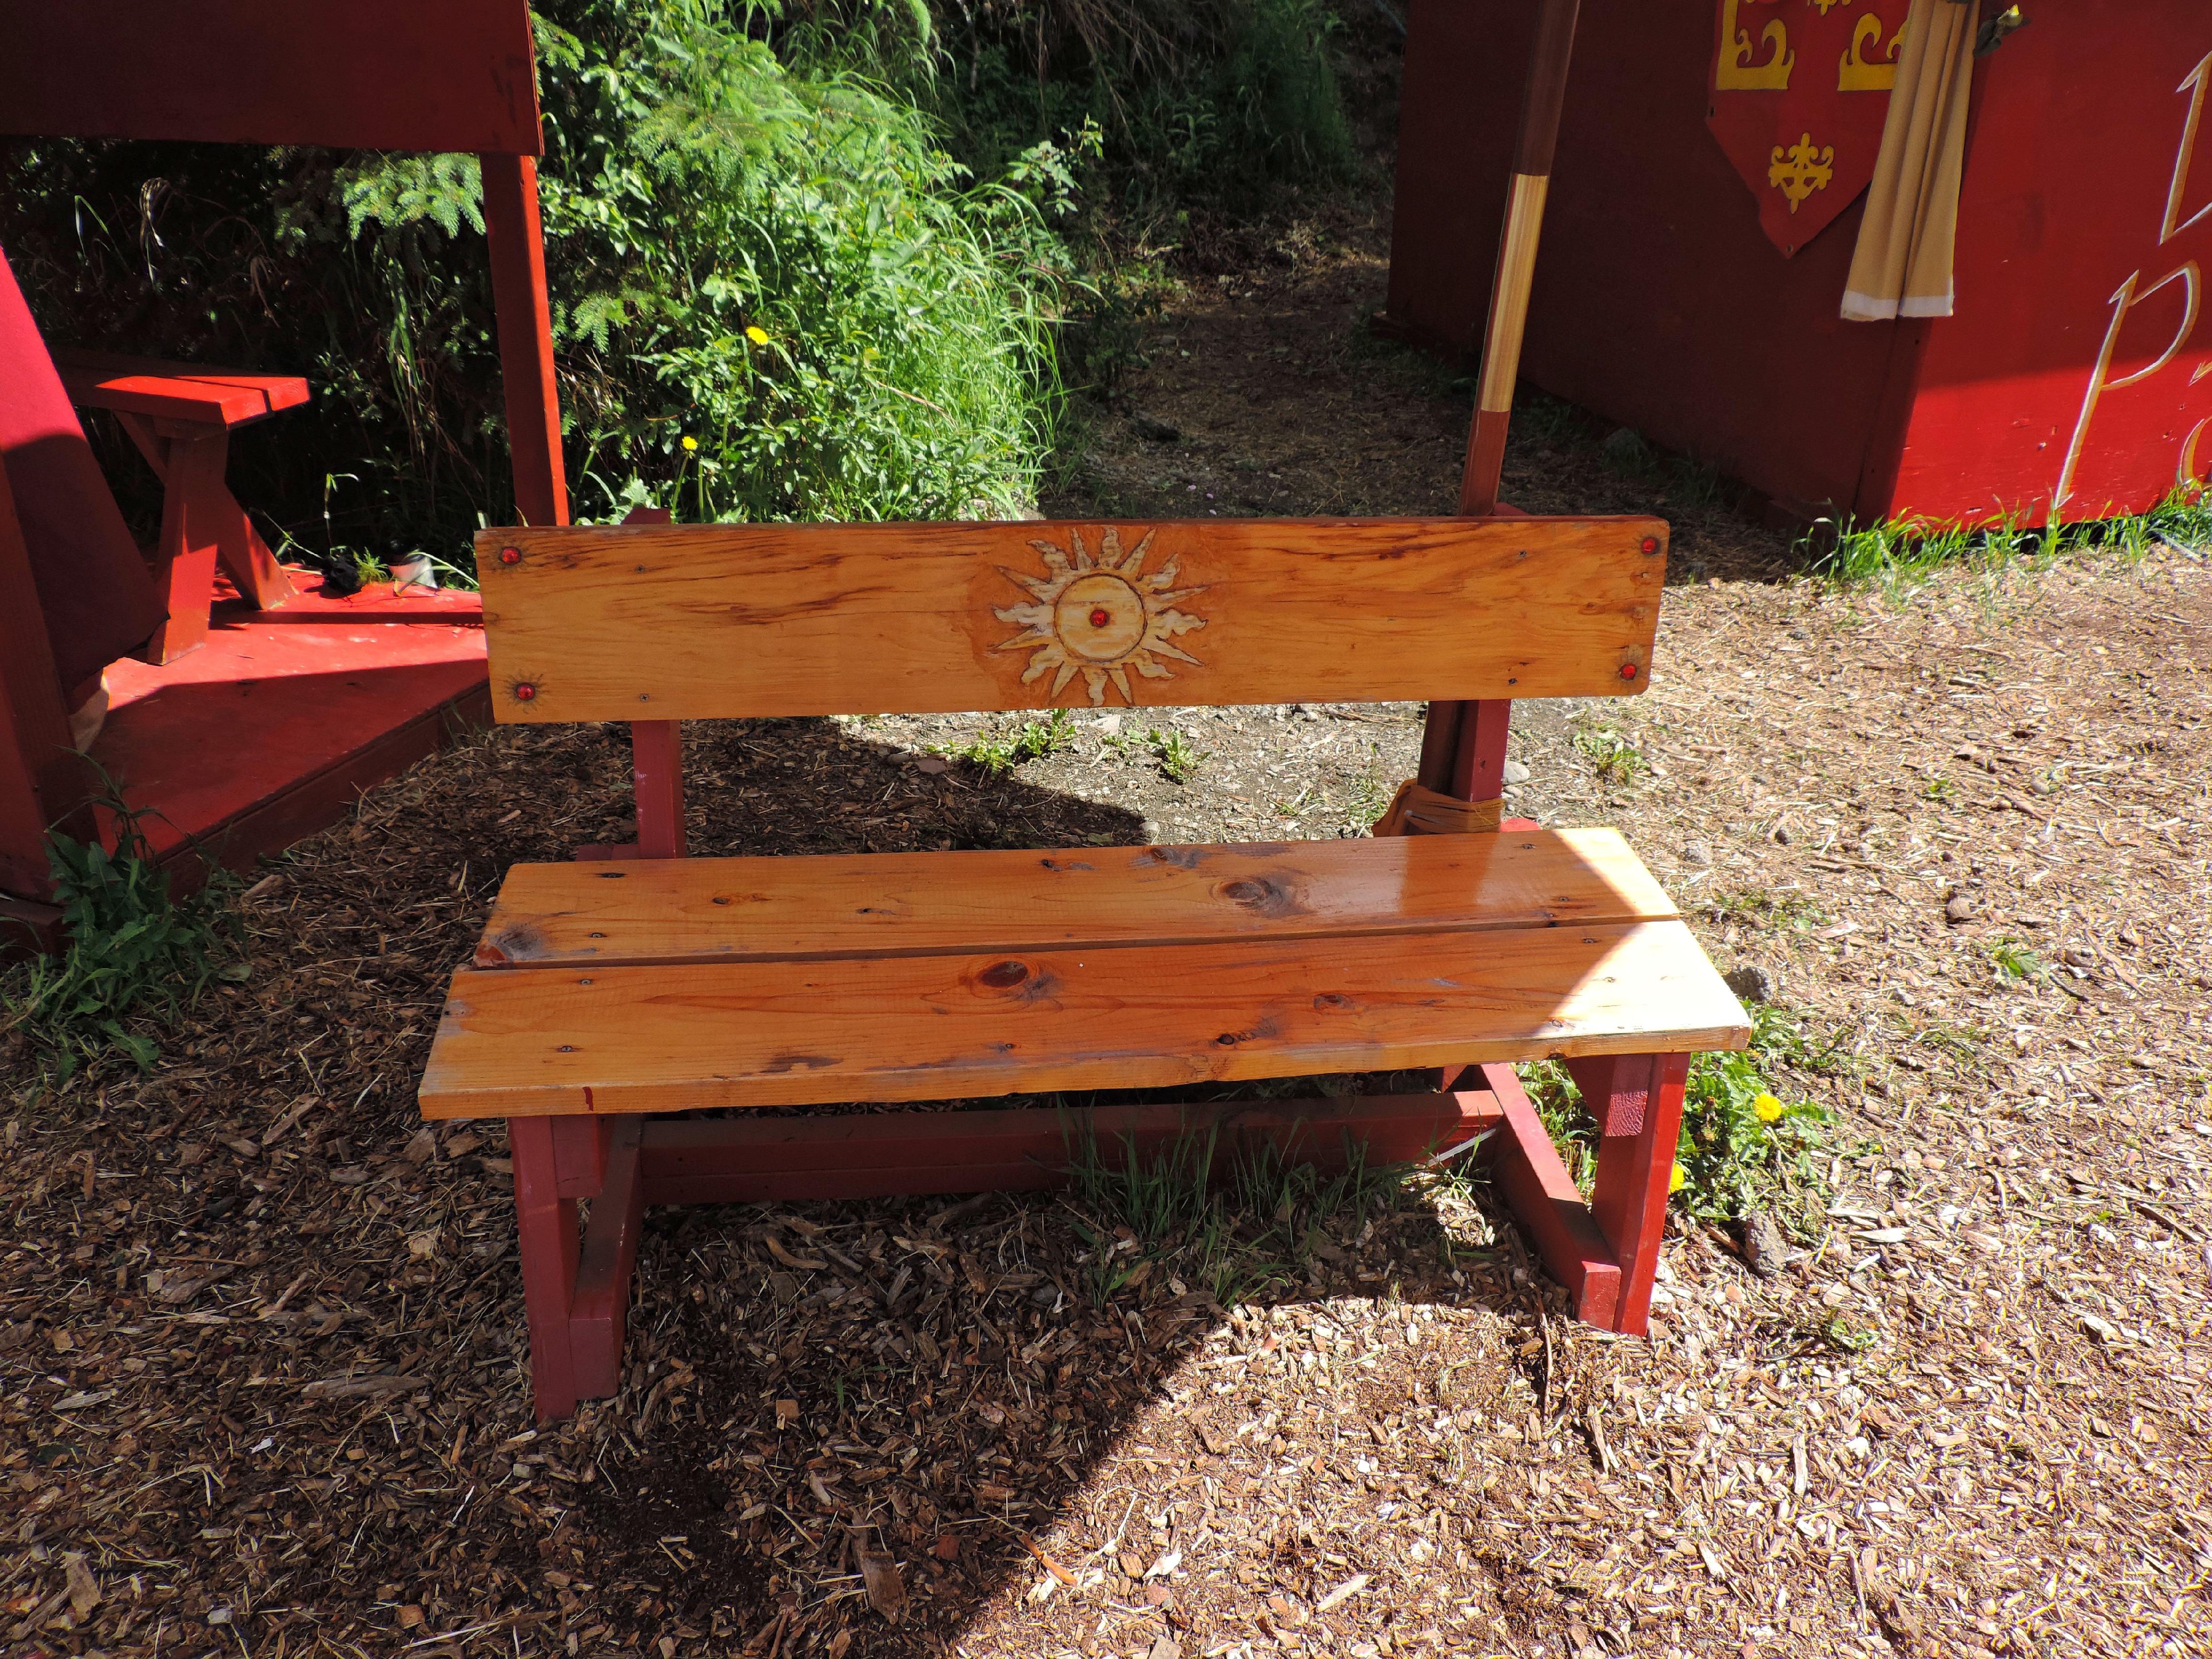 A seat under the sun by MakoBerryShortcake